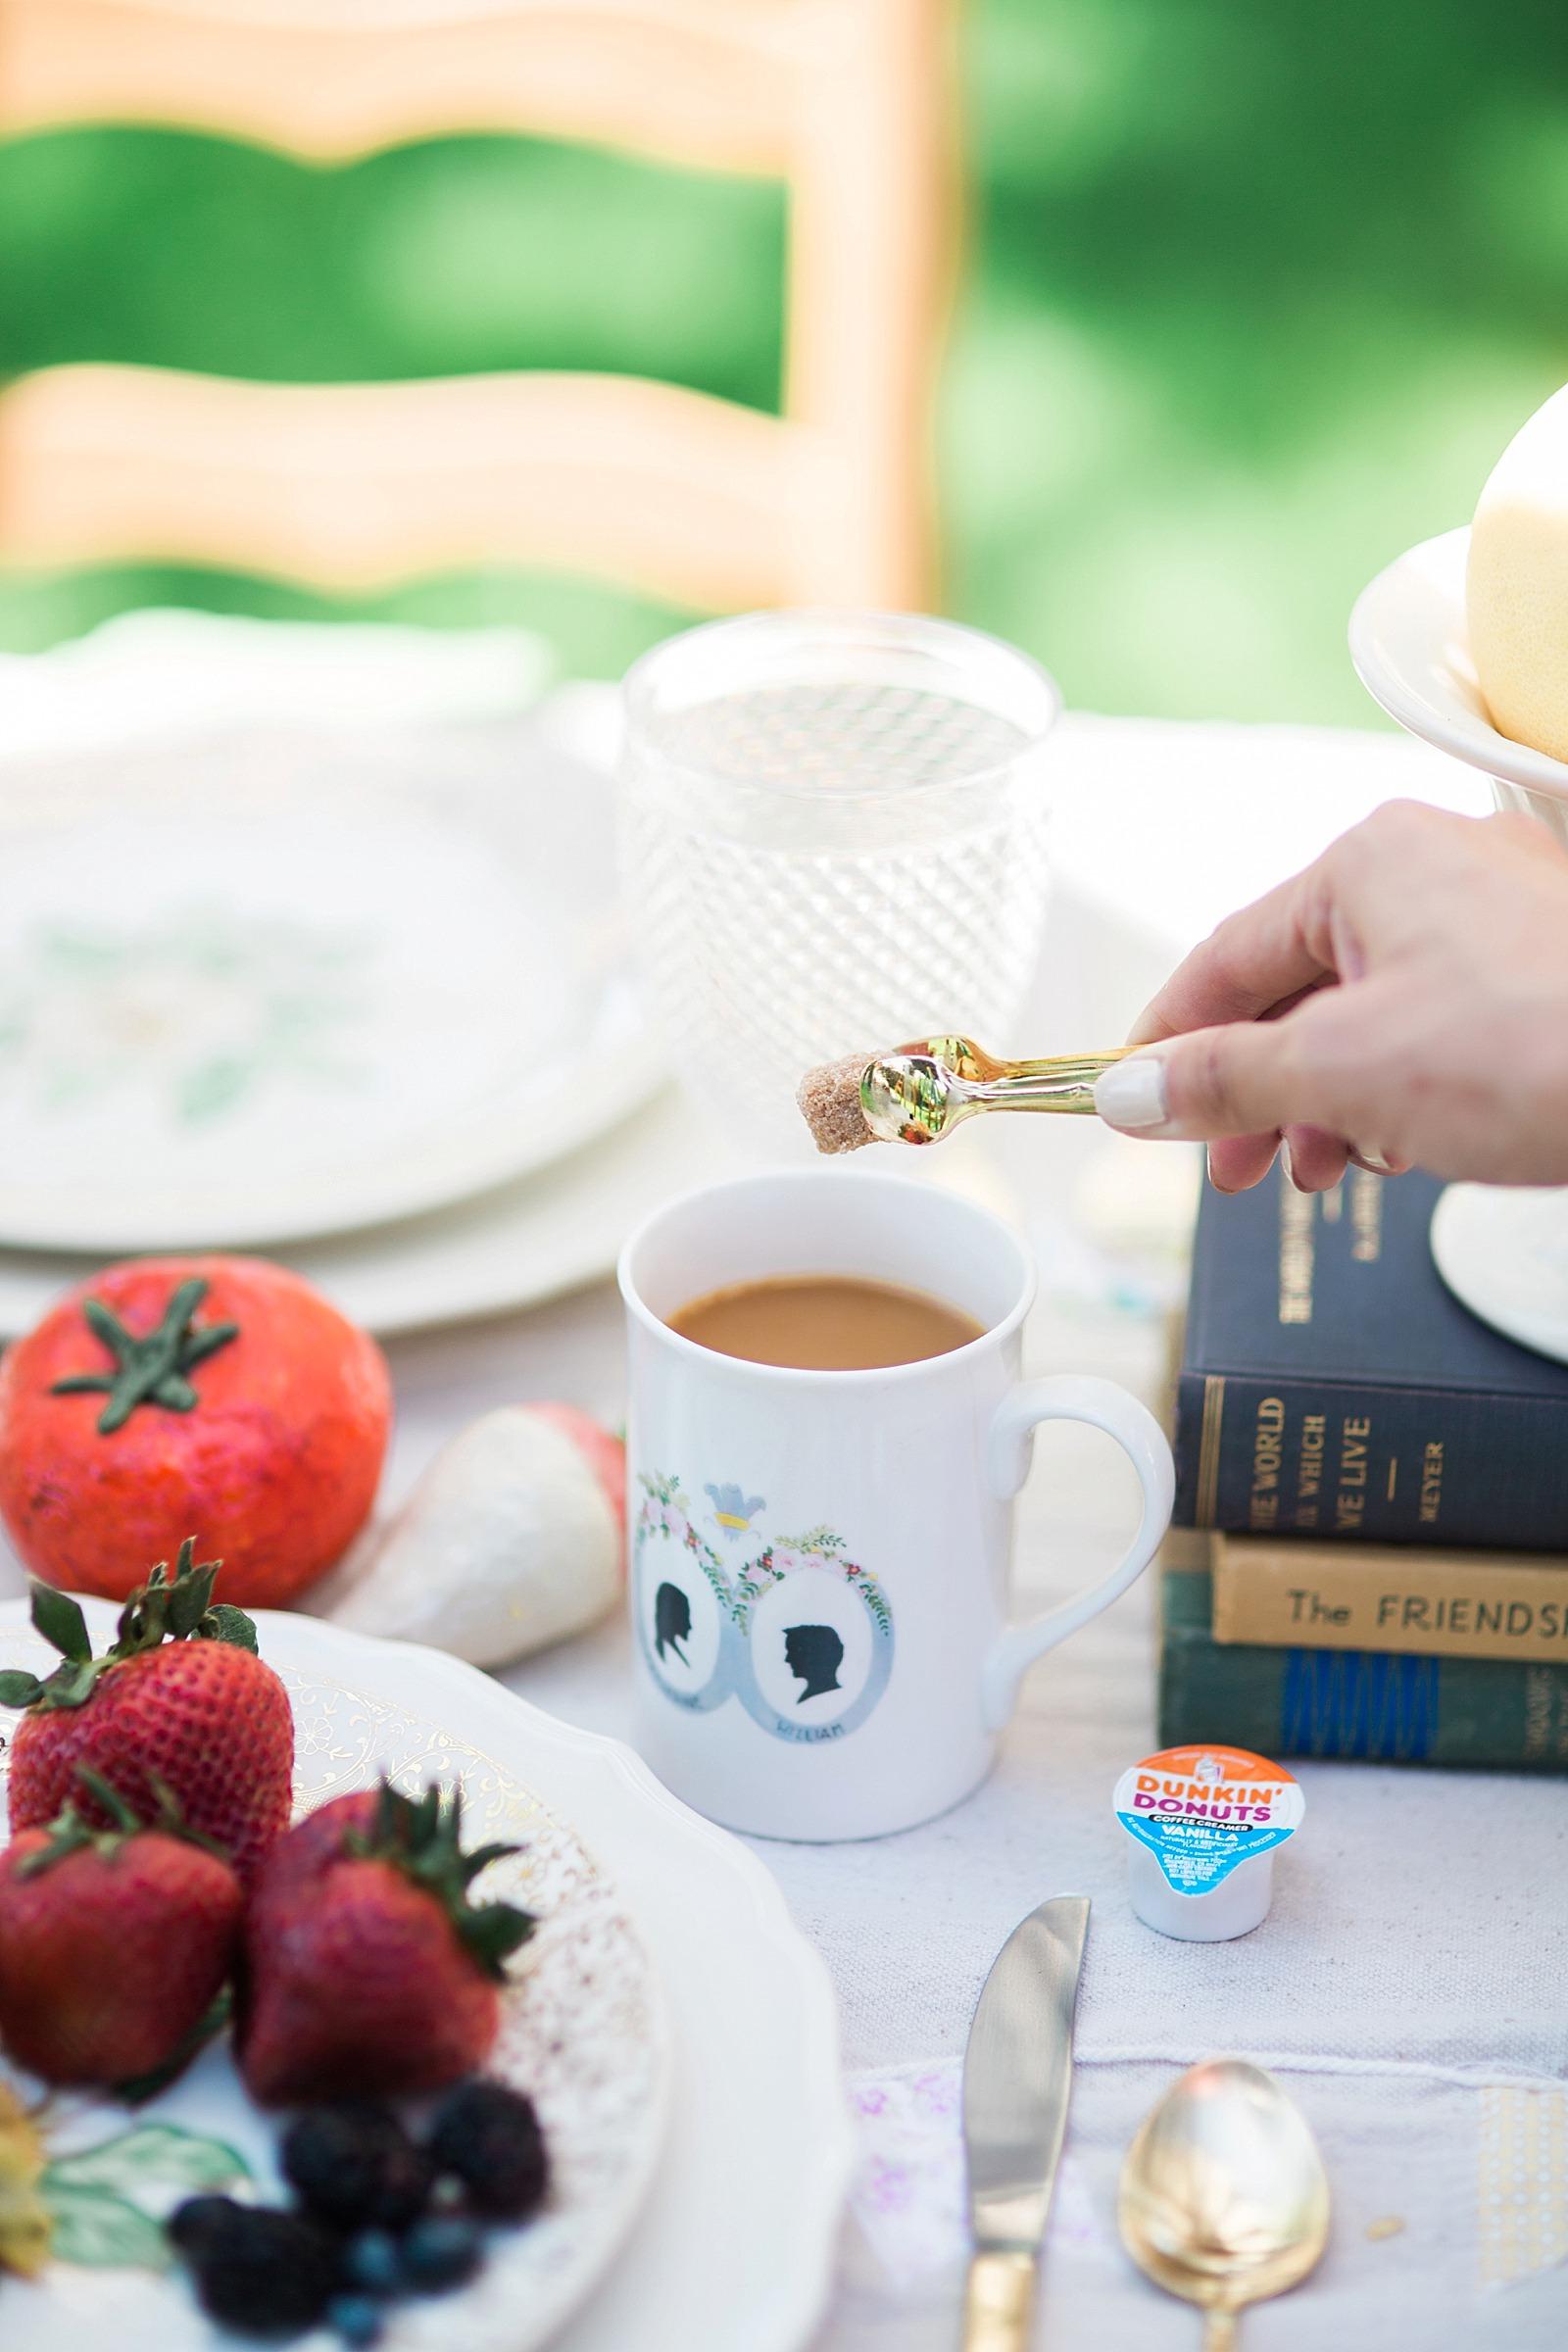 diana-elizabeth-blog-lifestyle-dunkin-creamers-dunkin-donuts-brunch-book-club--4592